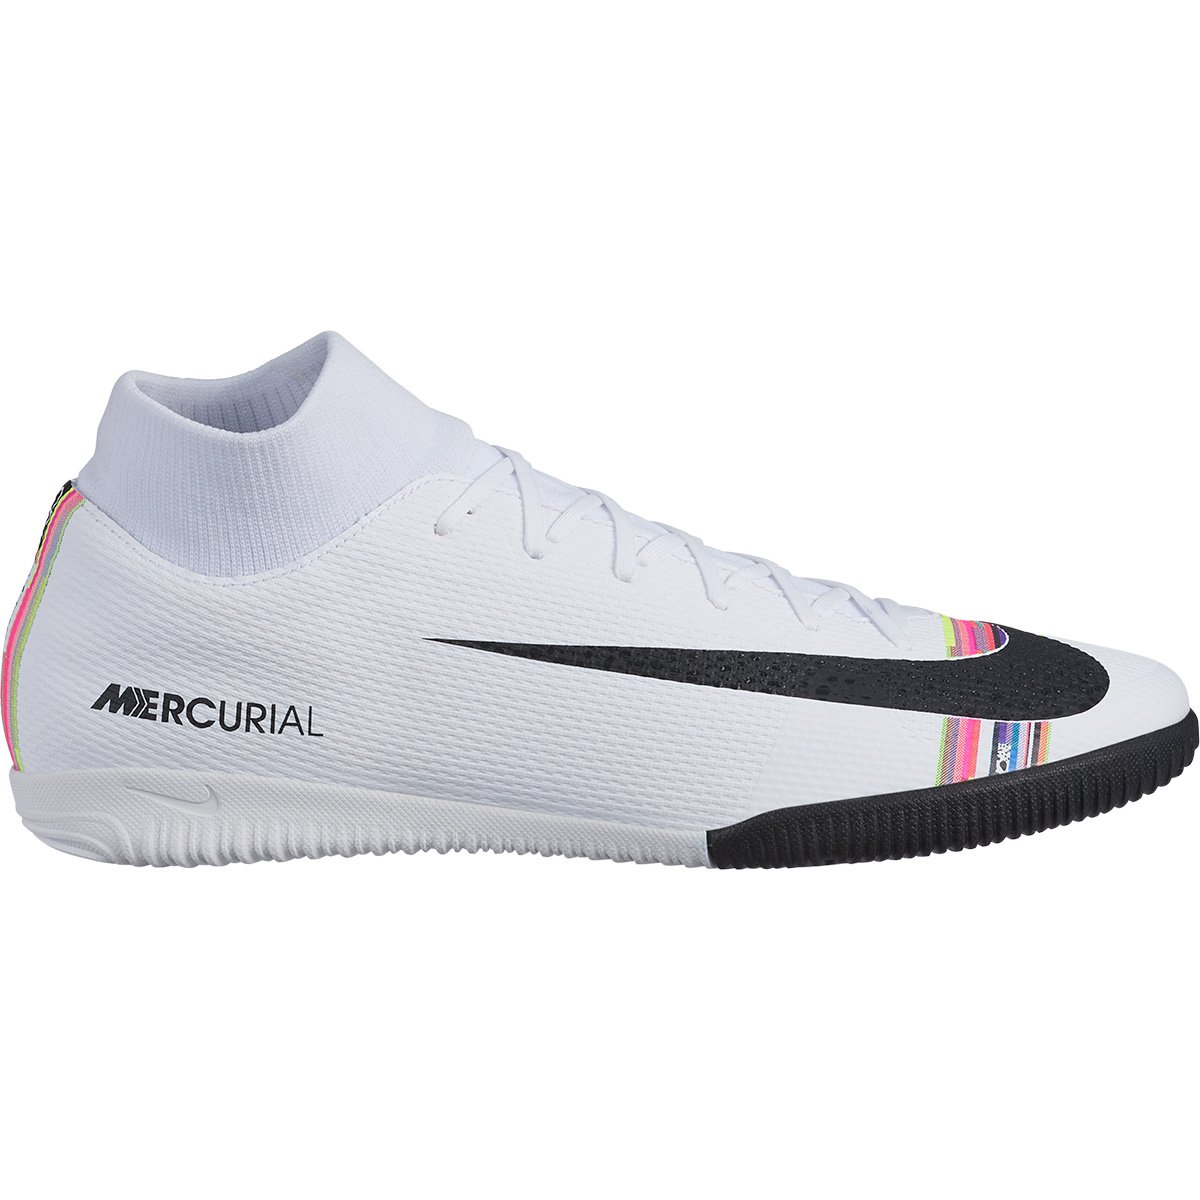 8b707d6122 Chuteira Futsal Nike Mercurial Superfly 6 Academy CR7 IC - Branco e Preto